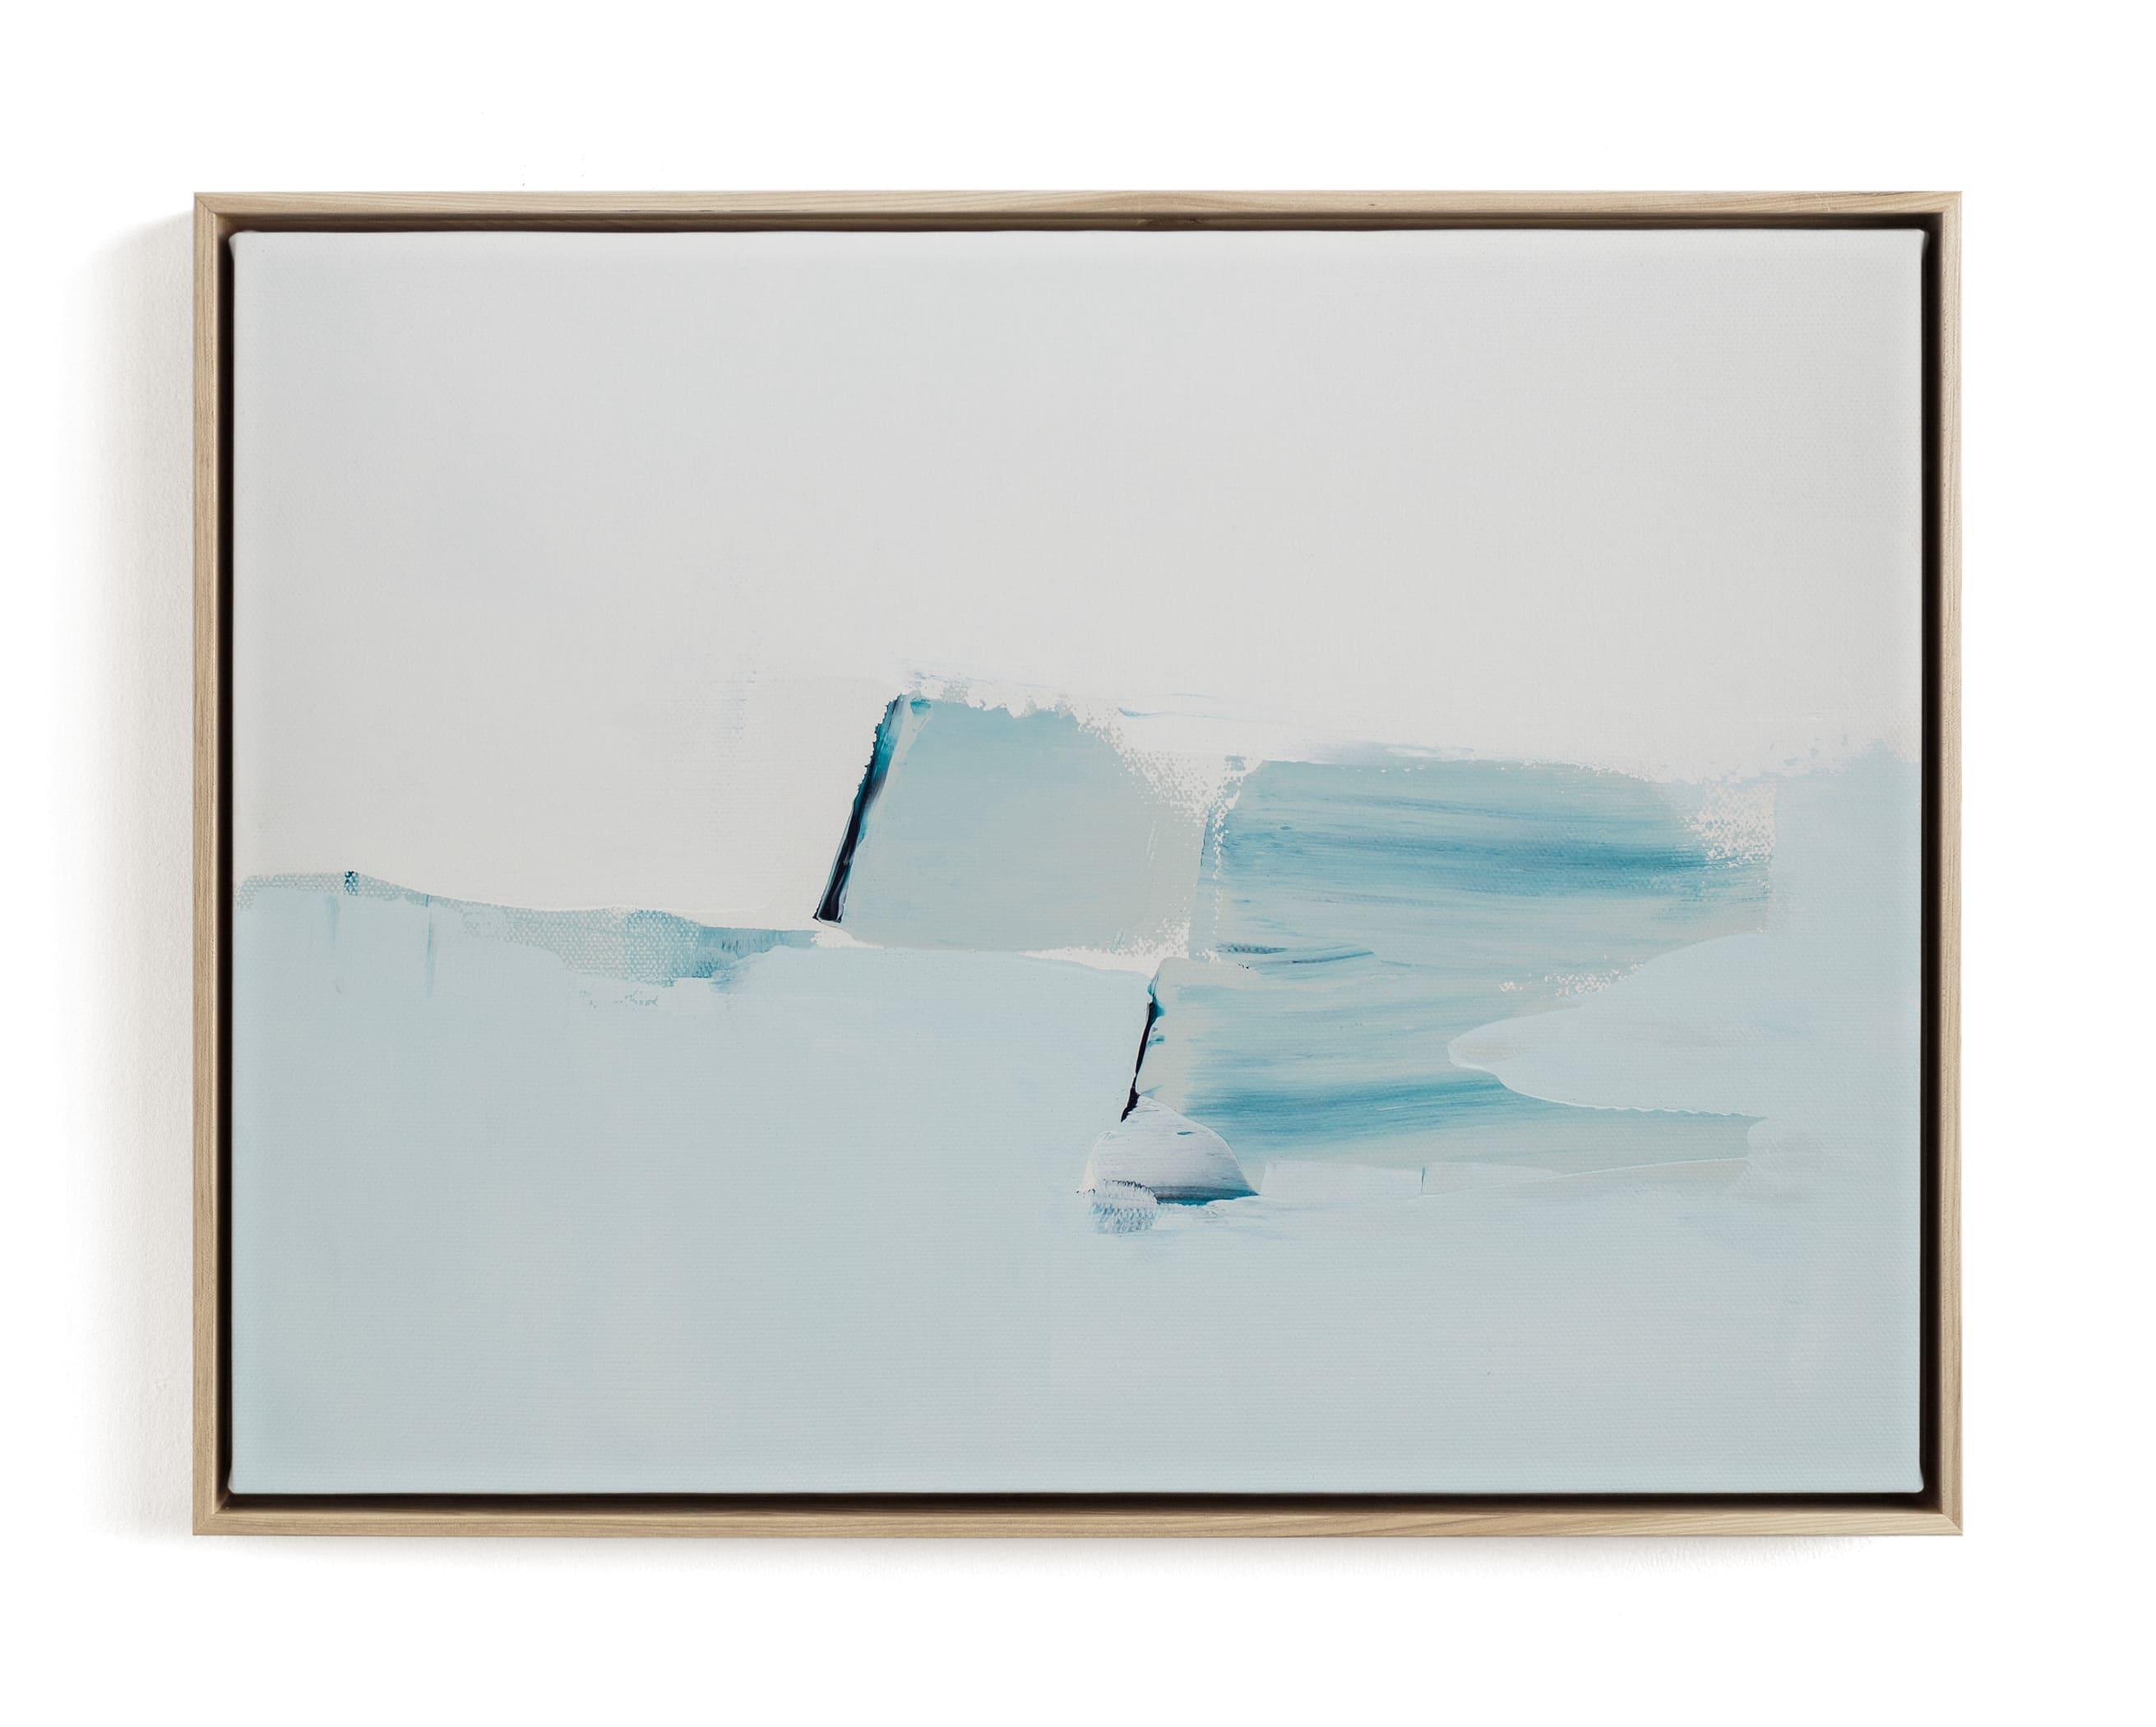 Sea Spray Landscape Wall Art Print